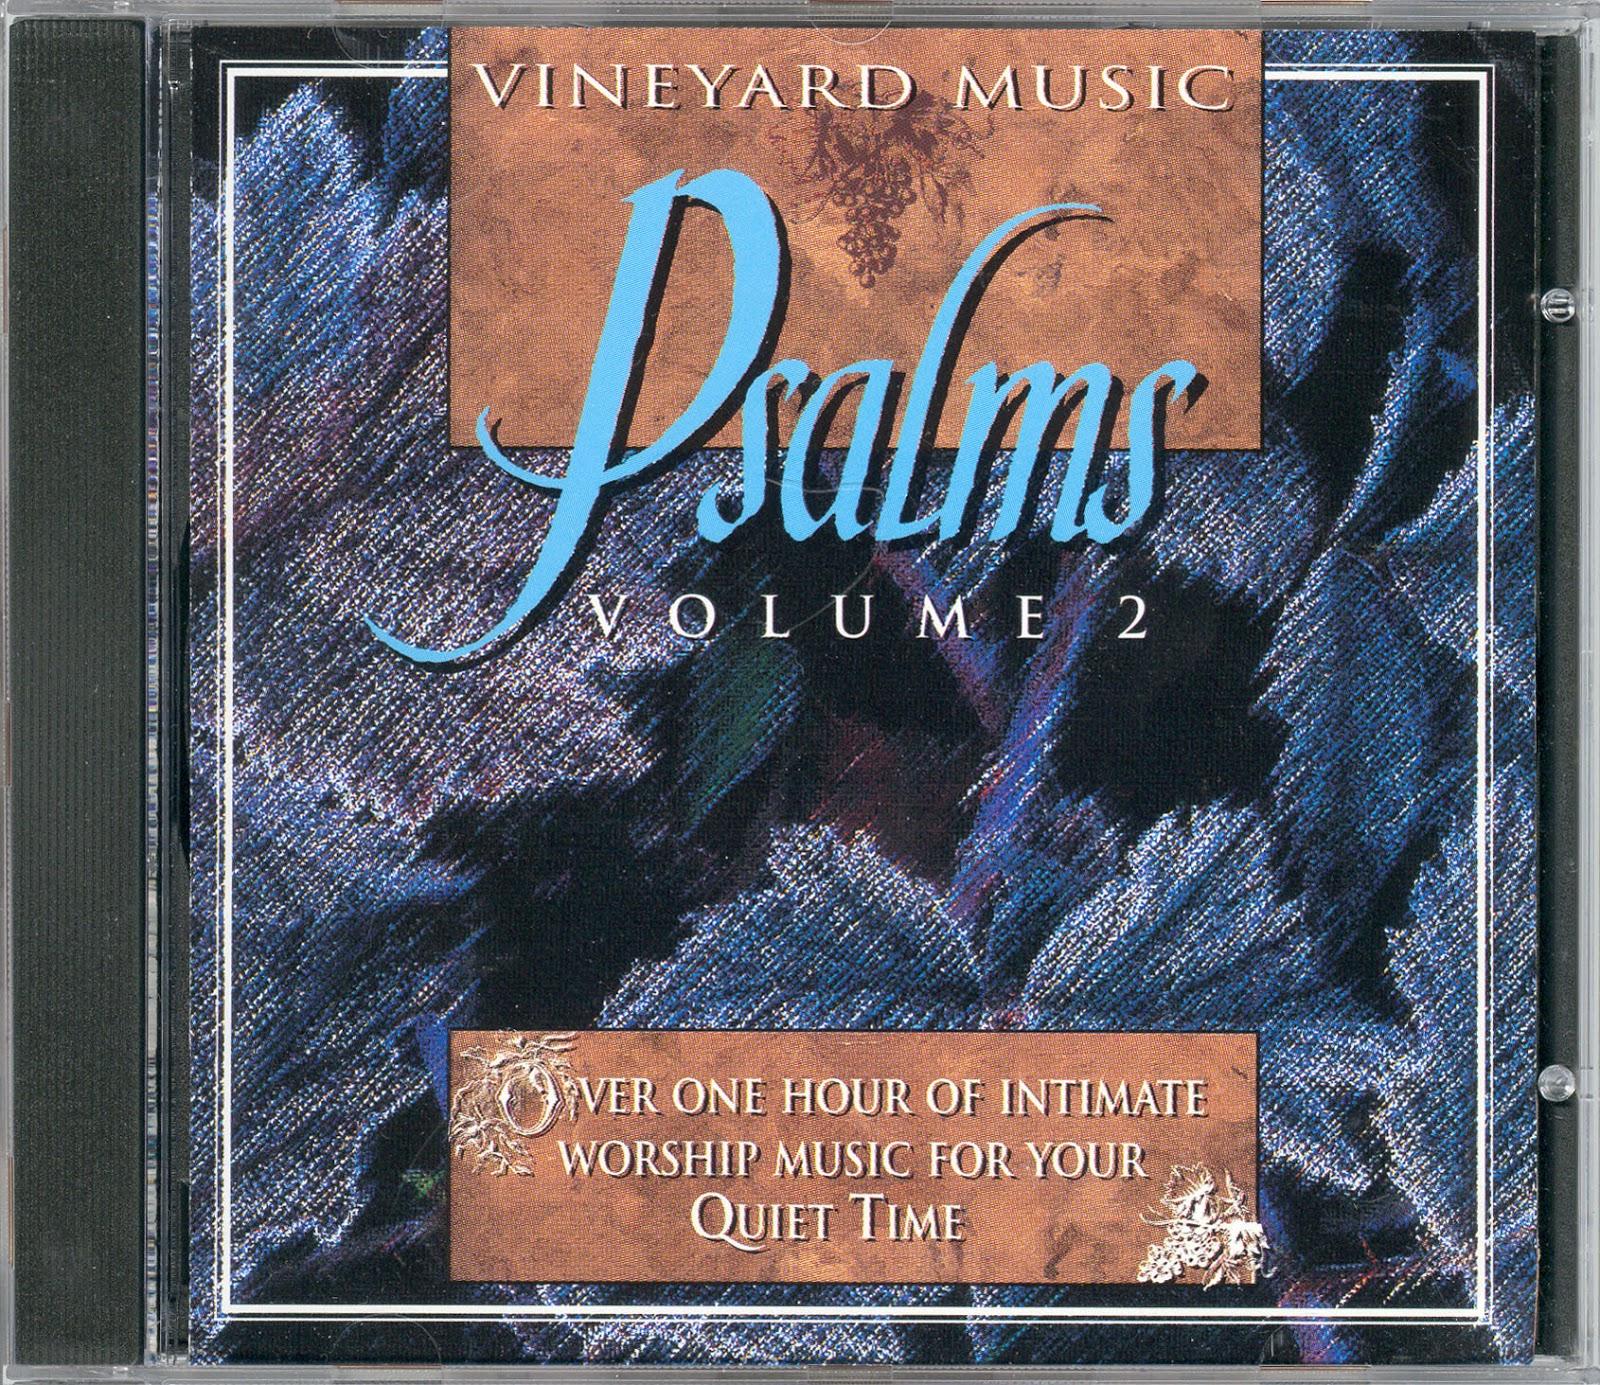 Vineyard Music-Psalms-Vol 2-